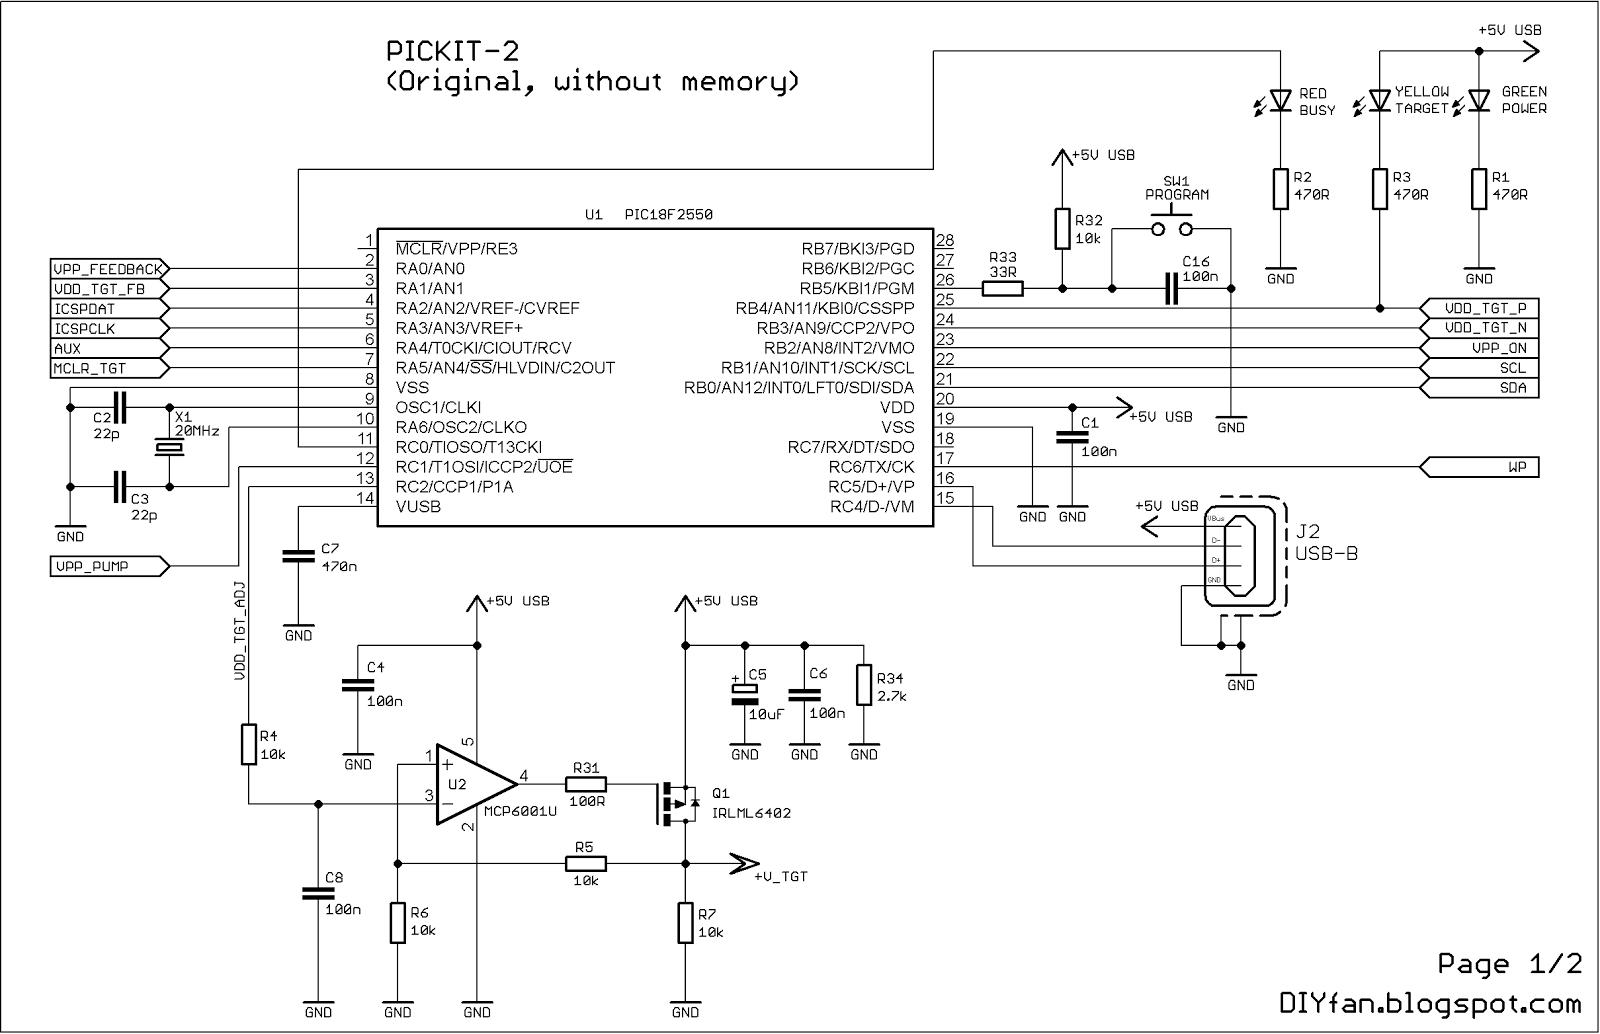 Original Pickit-2 Microcontroller Programmer